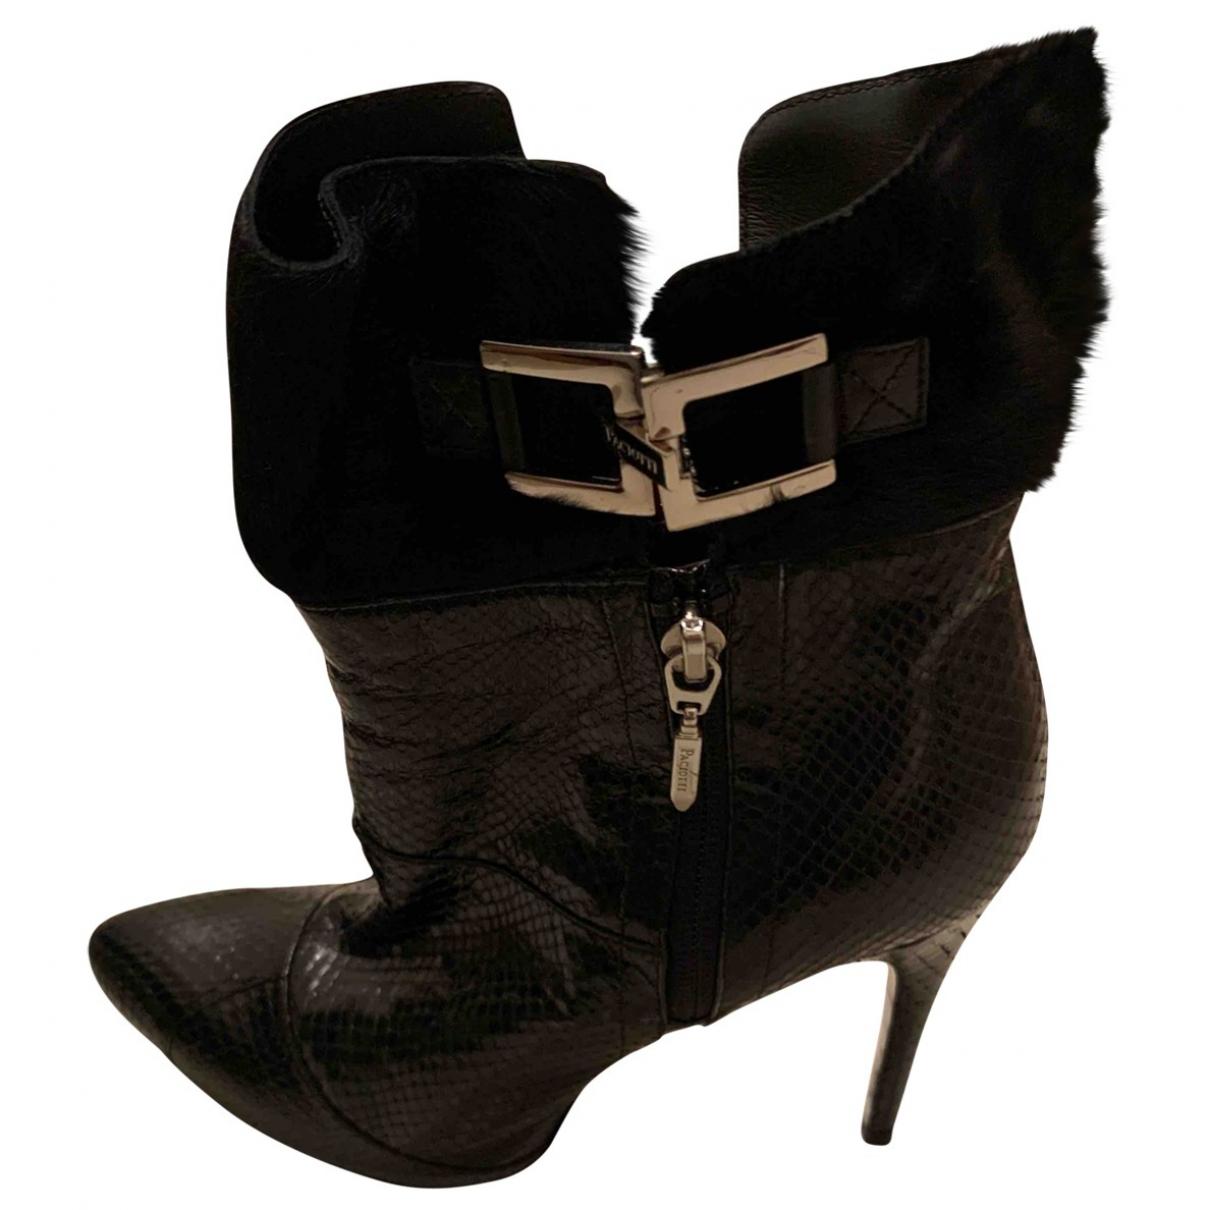 Cesare Paciotti \N Black Leather Ankle boots for Women 37.5 EU